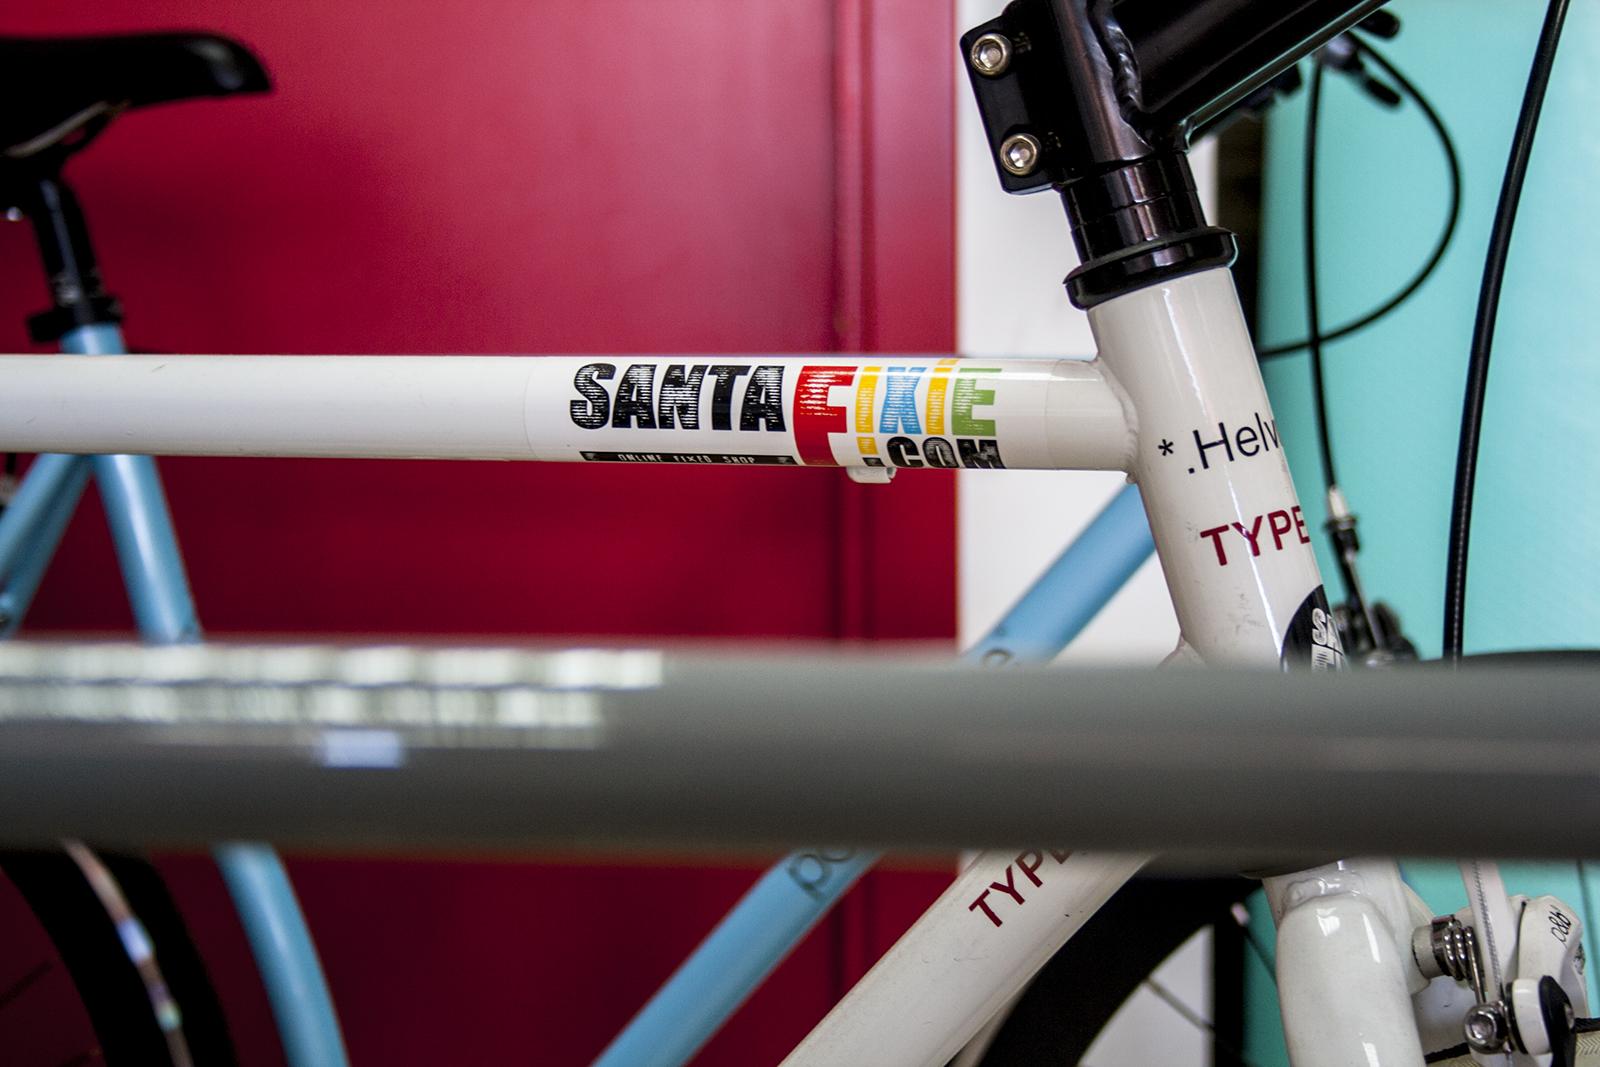 santafixie fixed bike